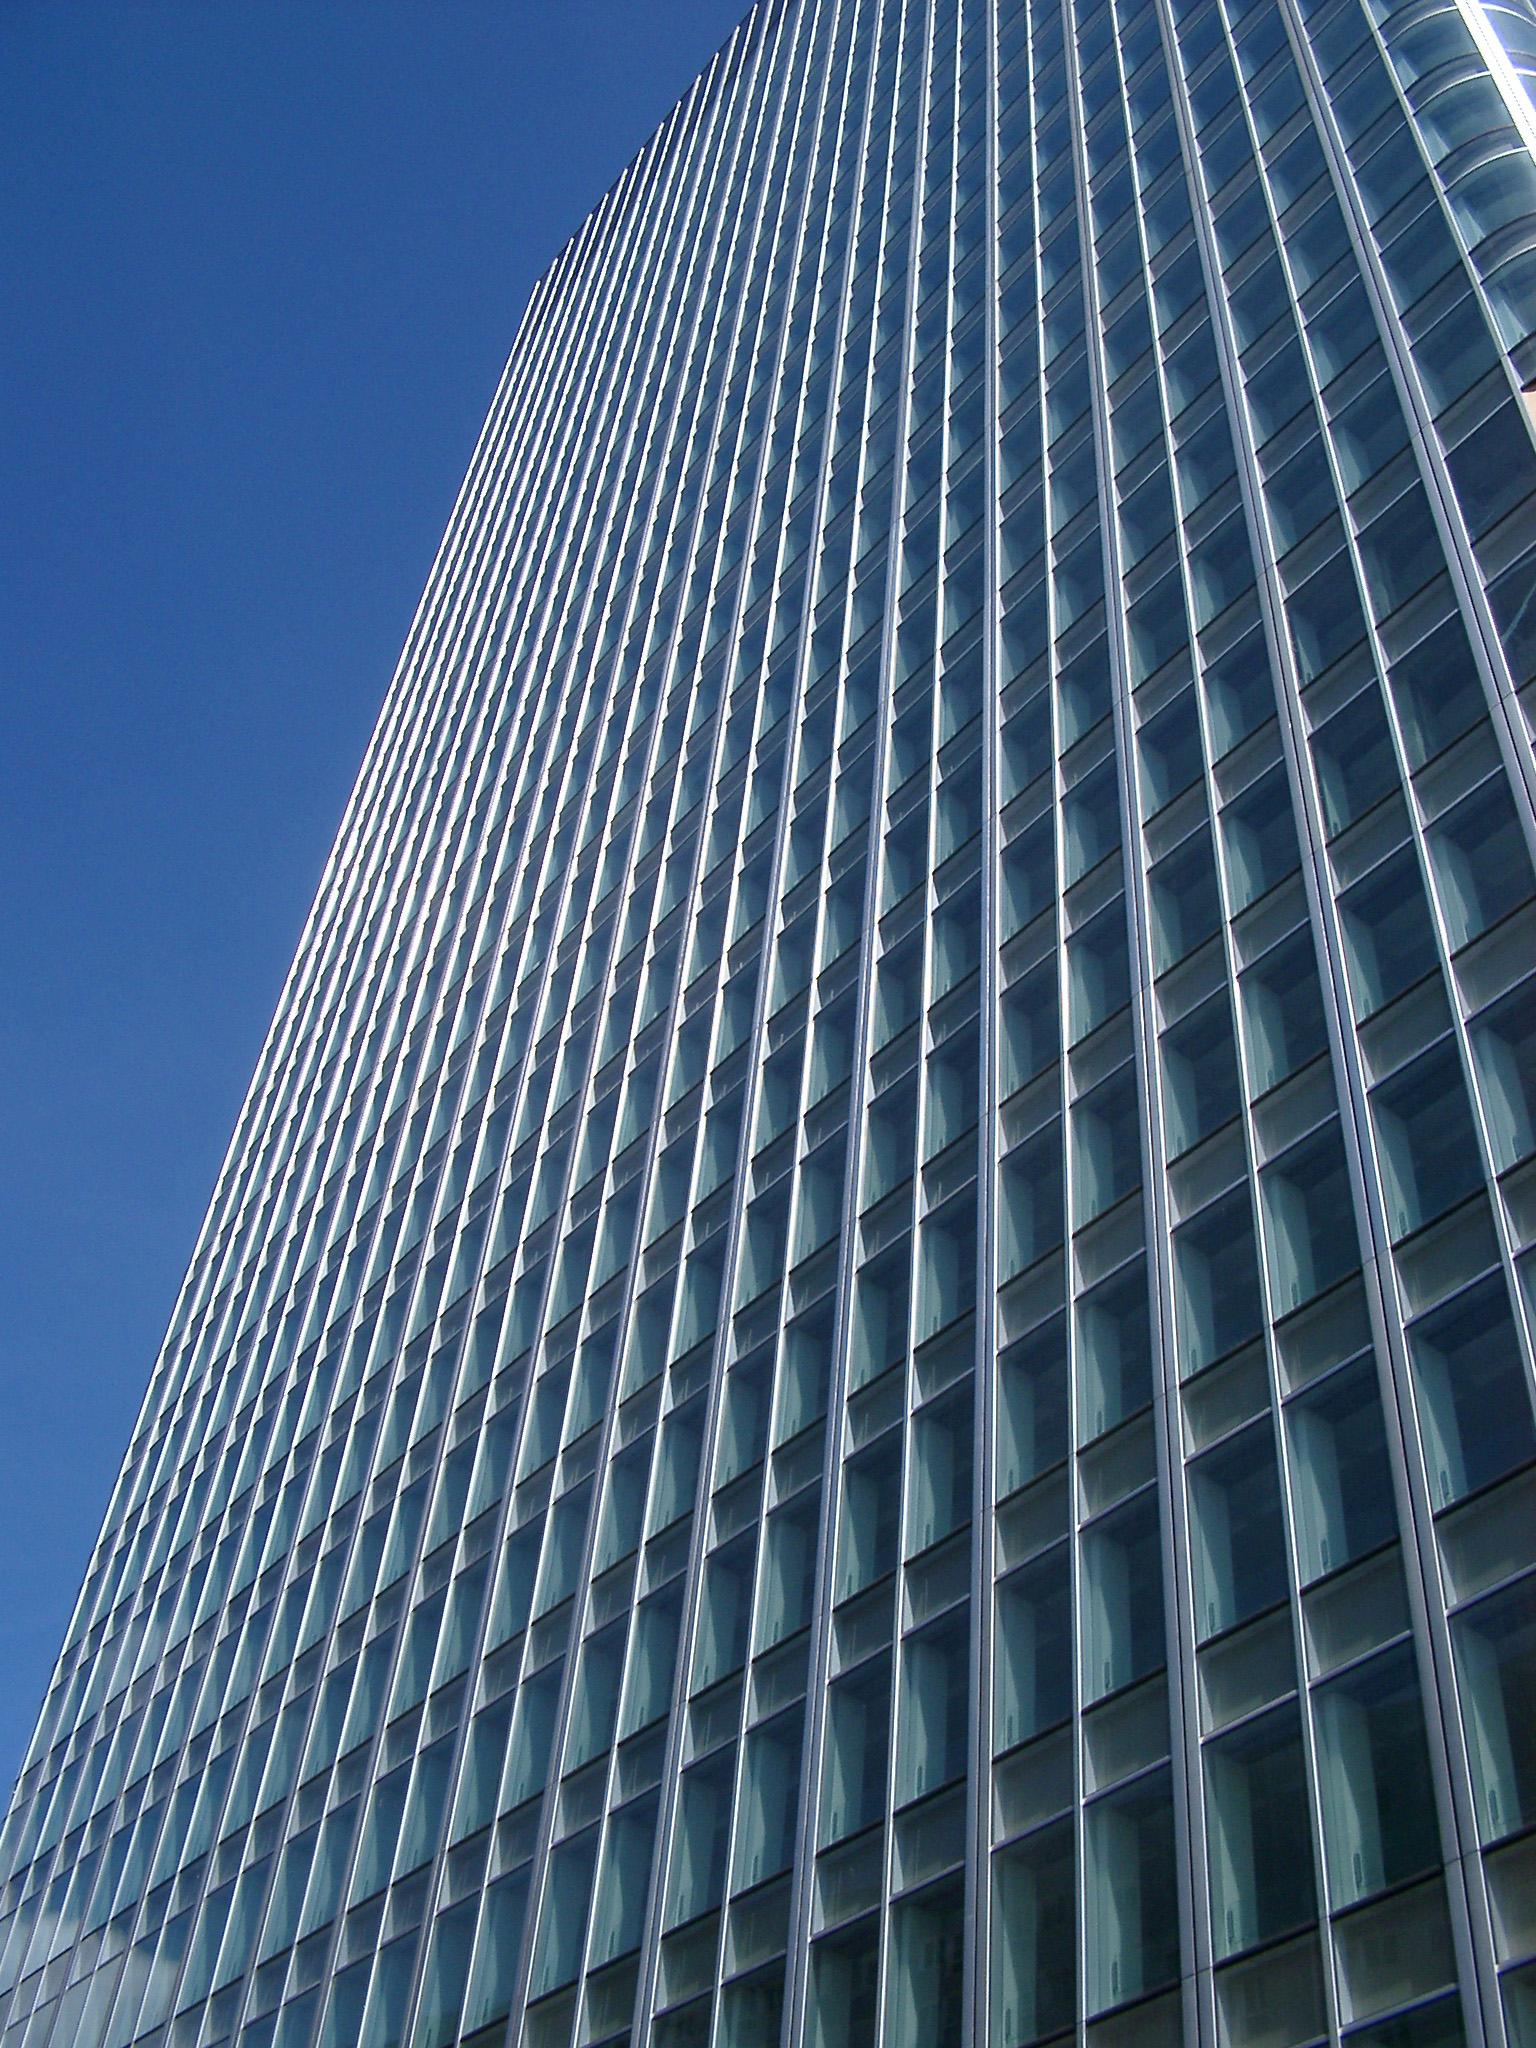 glass exterior modern office. Exterior Of A Modern Glass Office Building O